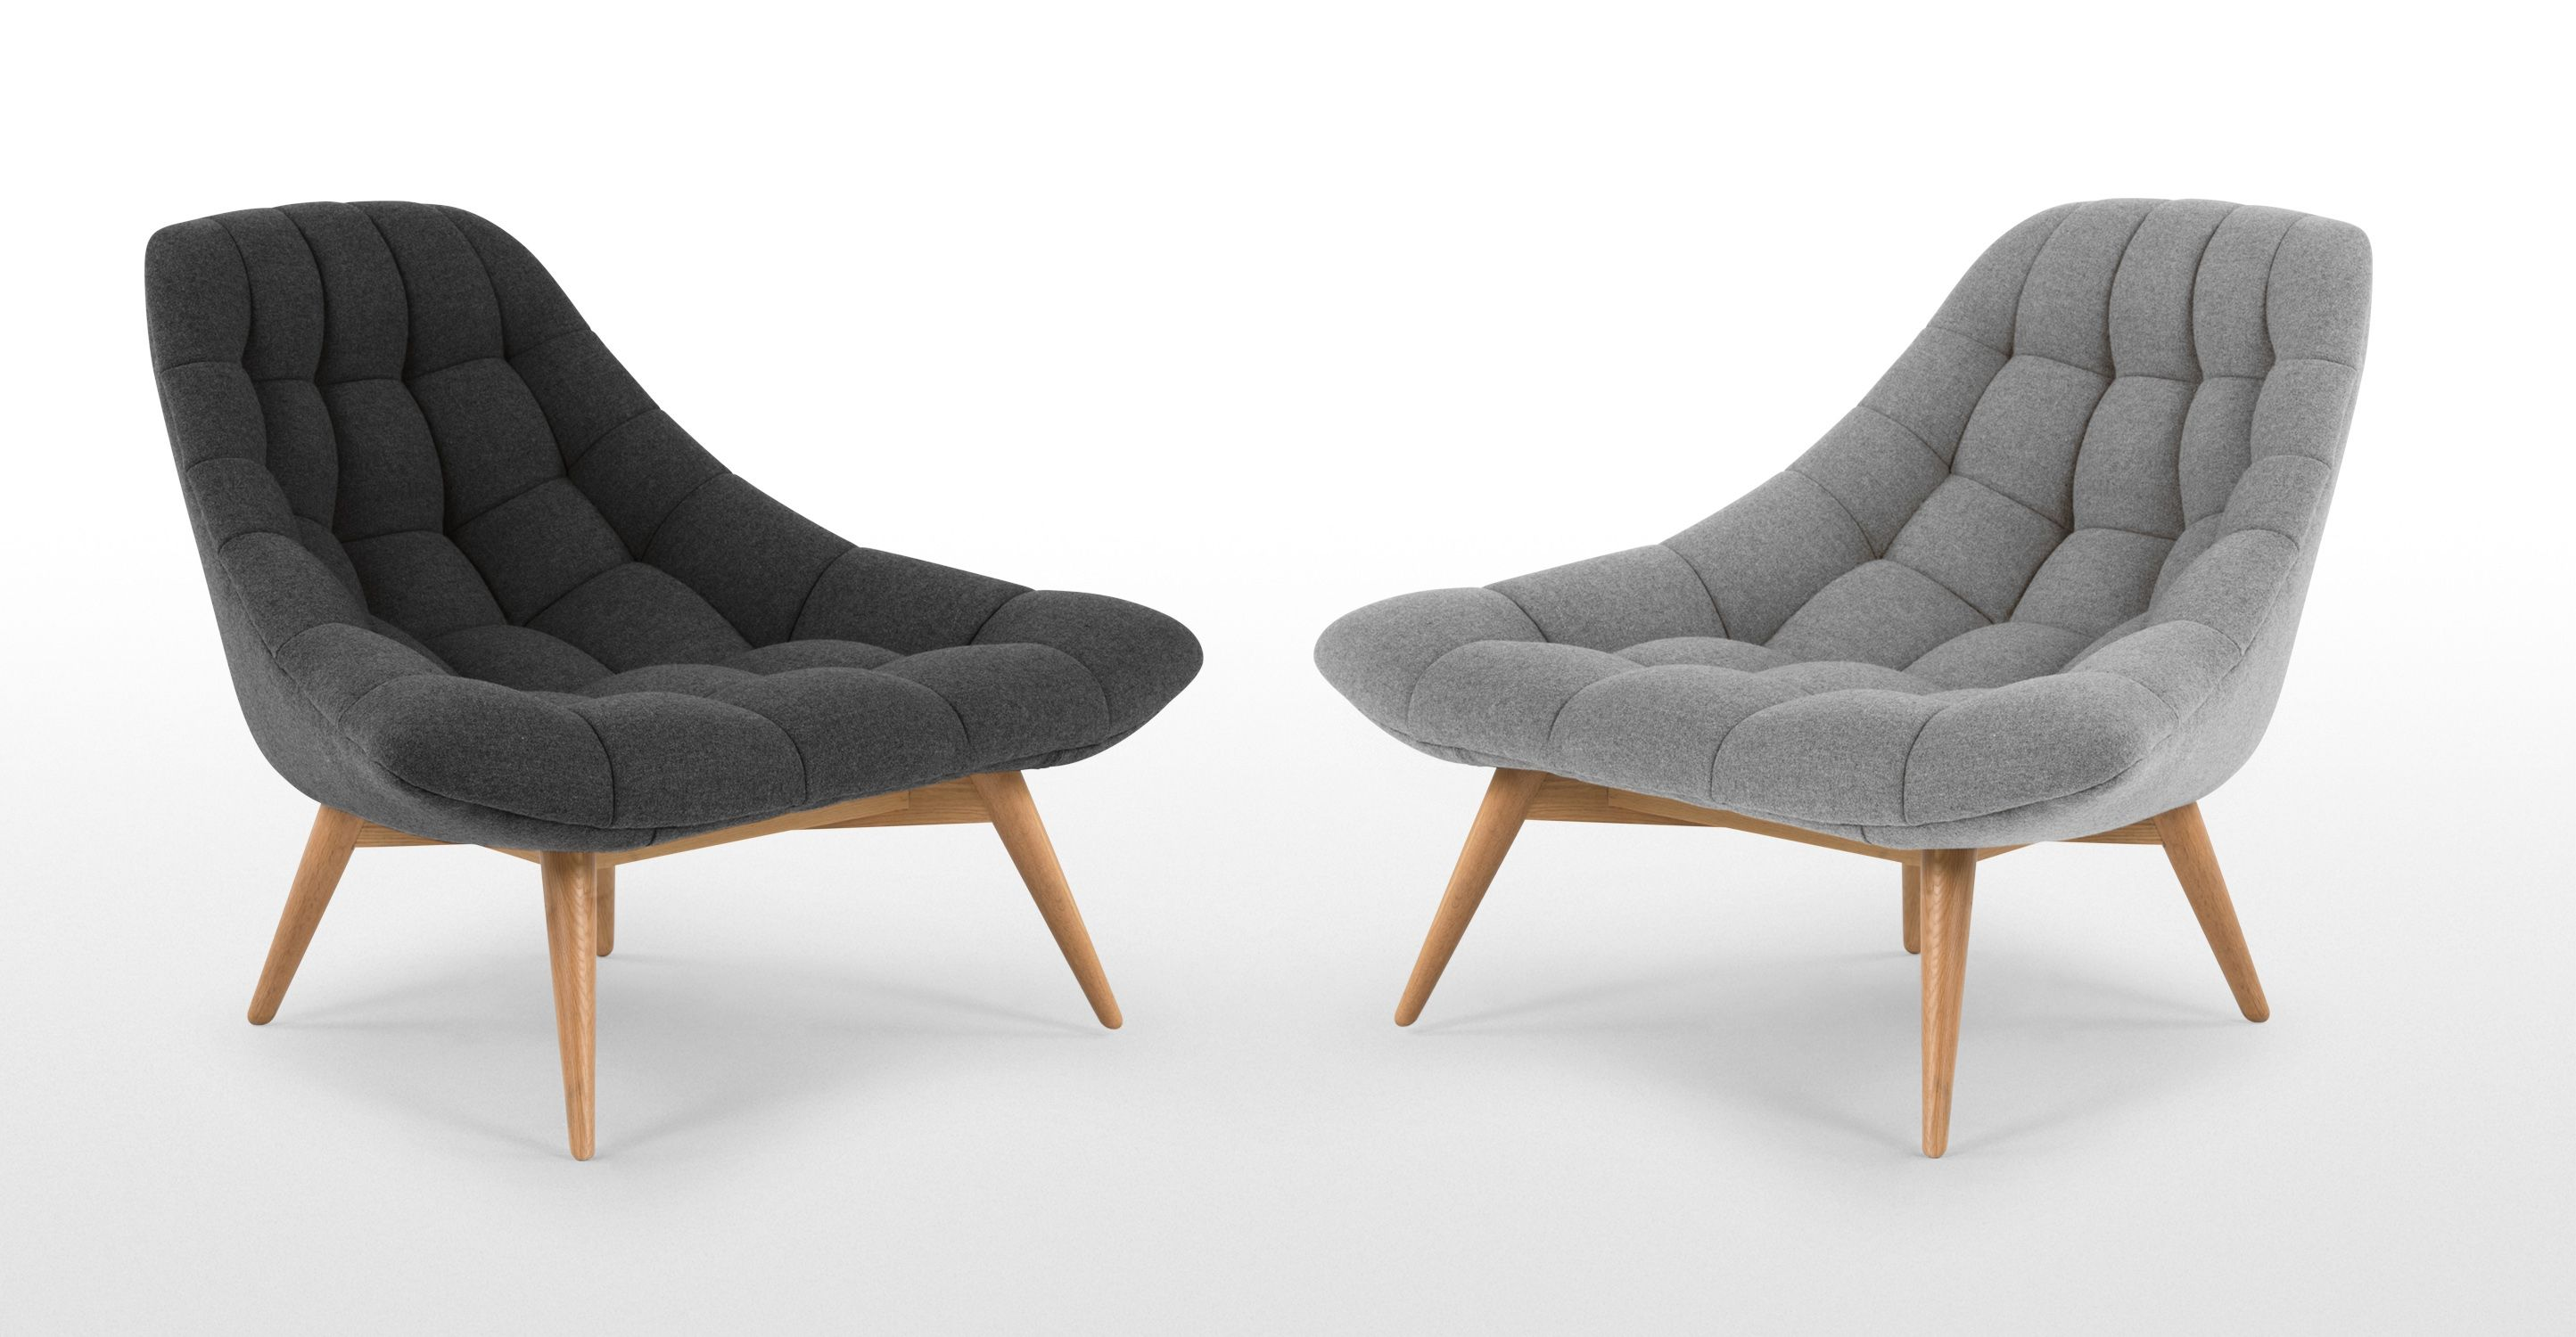 Design Sessel, Salz  Und Pfeffermuster, Retro Look Katalogbild | Haus |  Pinterest | Armchairs, Interiors And Room